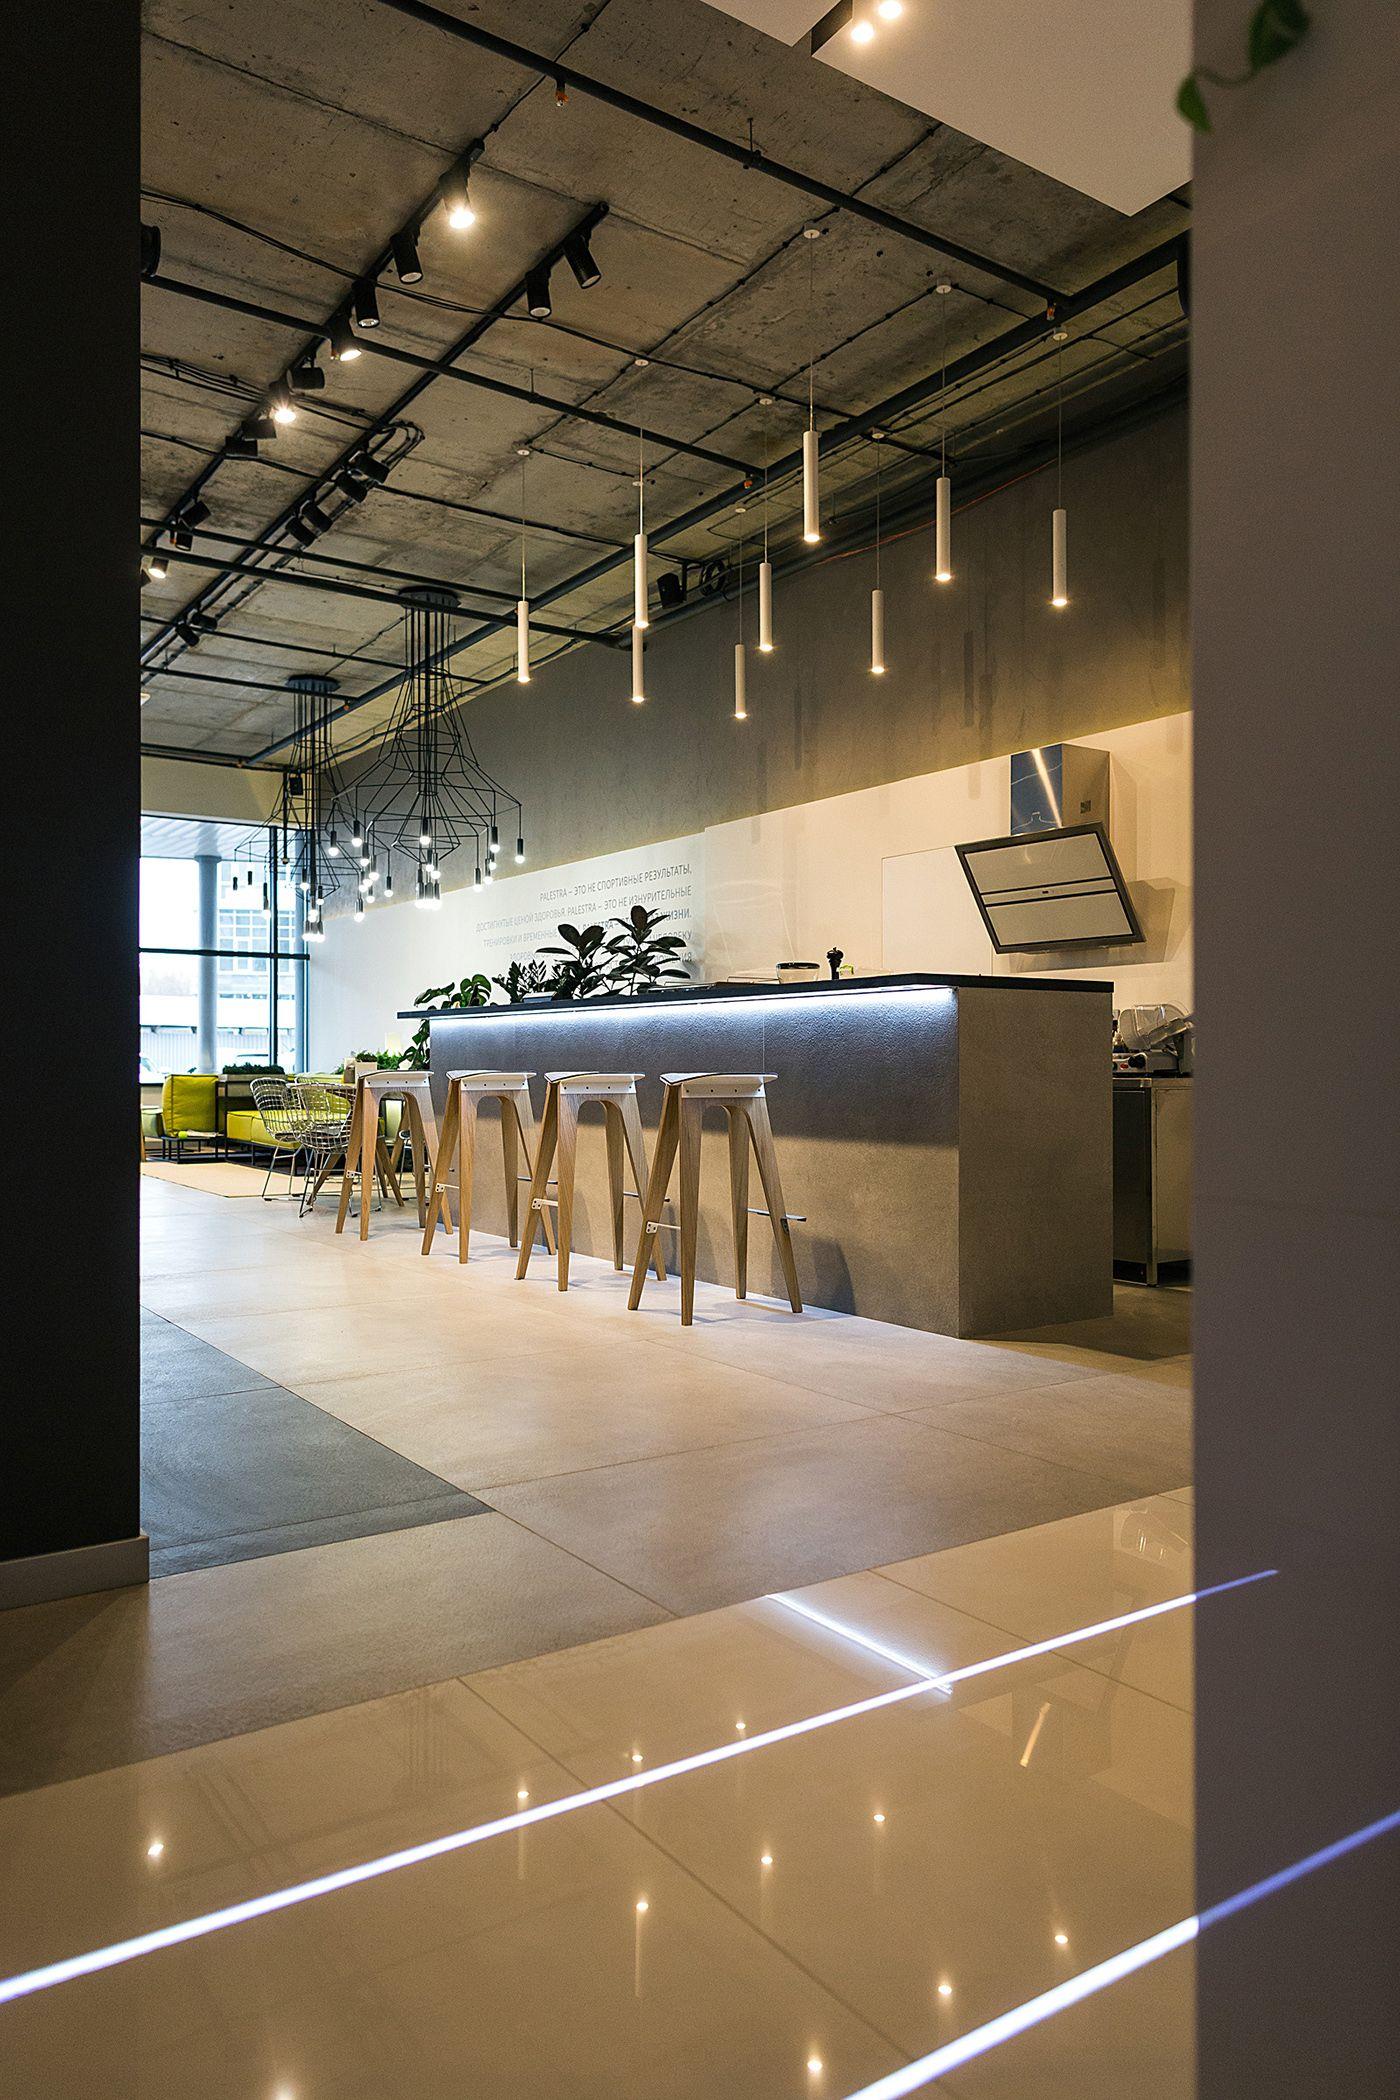 Interior Design Ideas For Home Gym: Https://www.behance.net/gallery/34395401/PALESTRA-Fitness